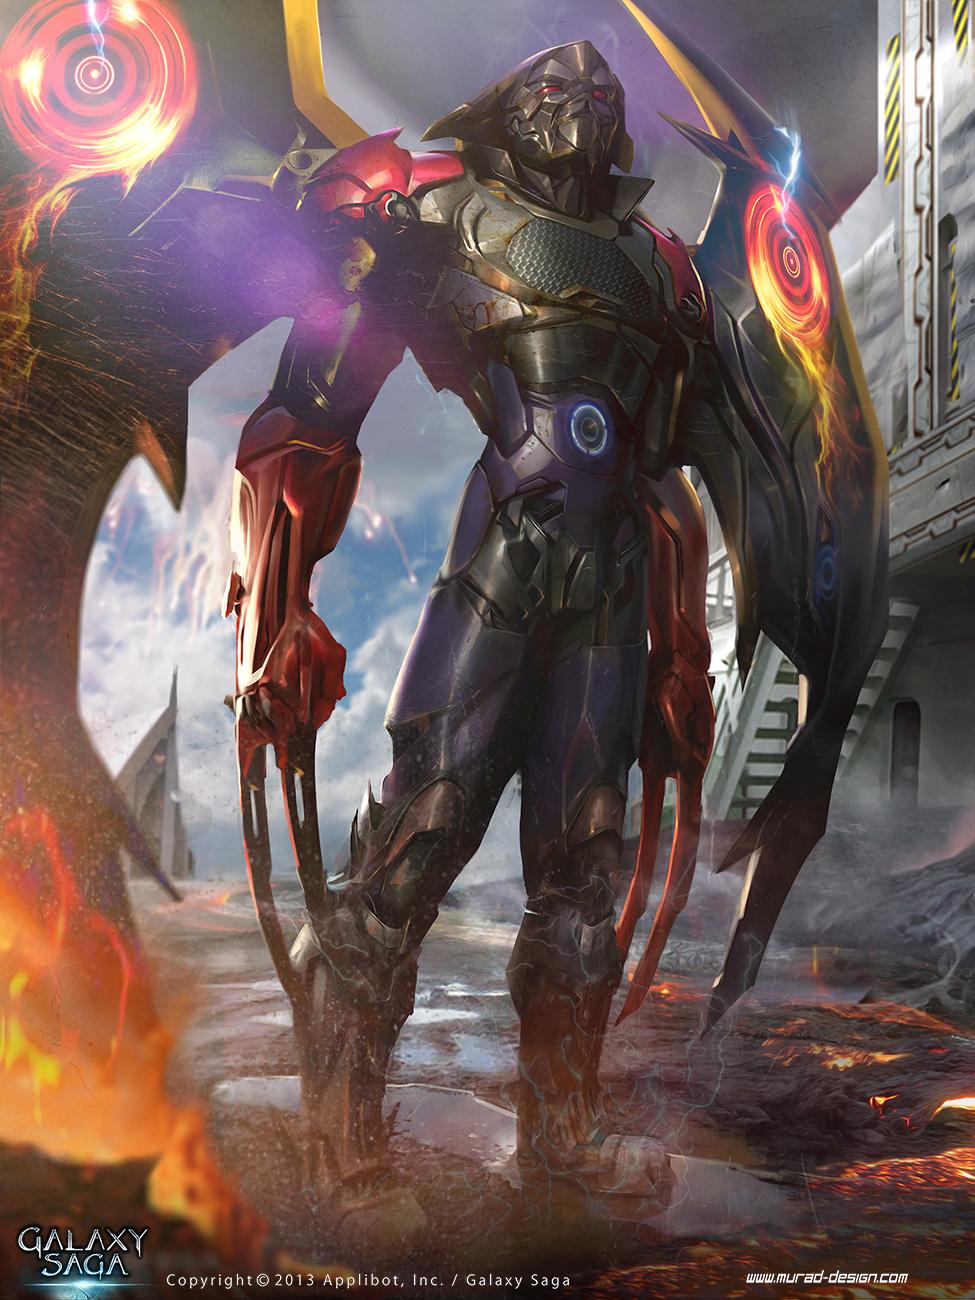 Demon hunter Evolution (Galaxy Saga) by MatiasMurad